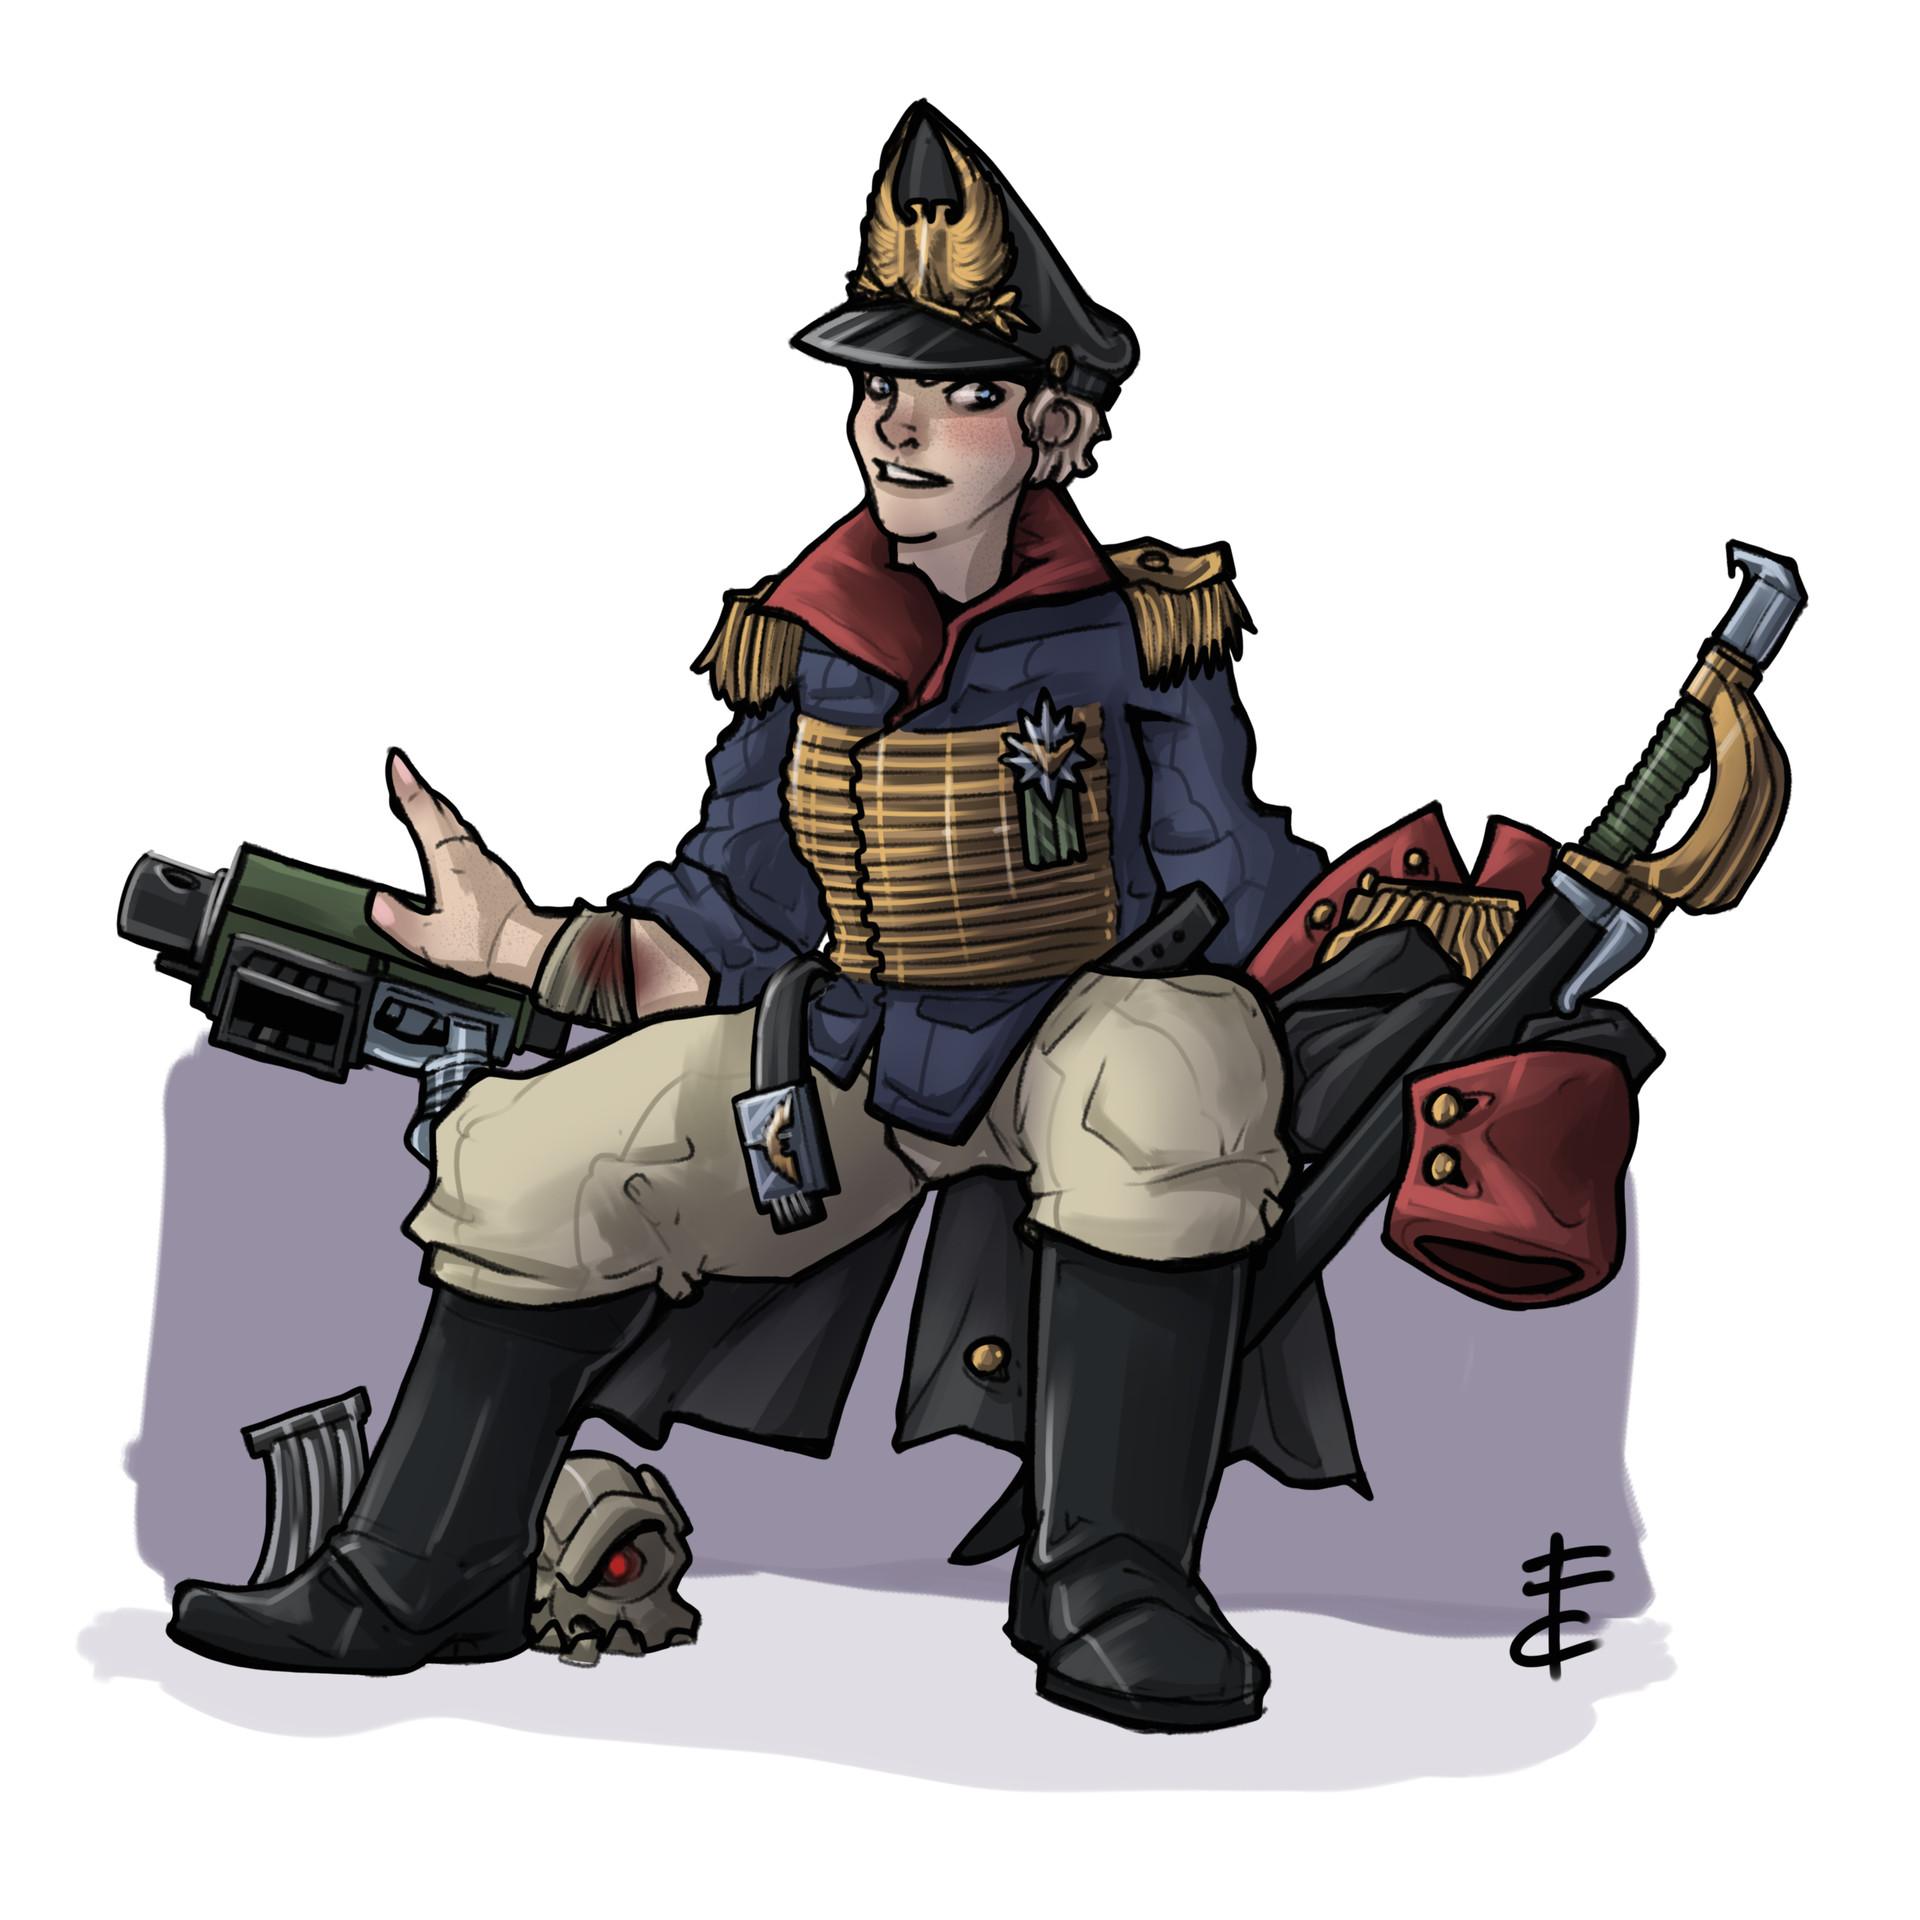 Commissar Cadet